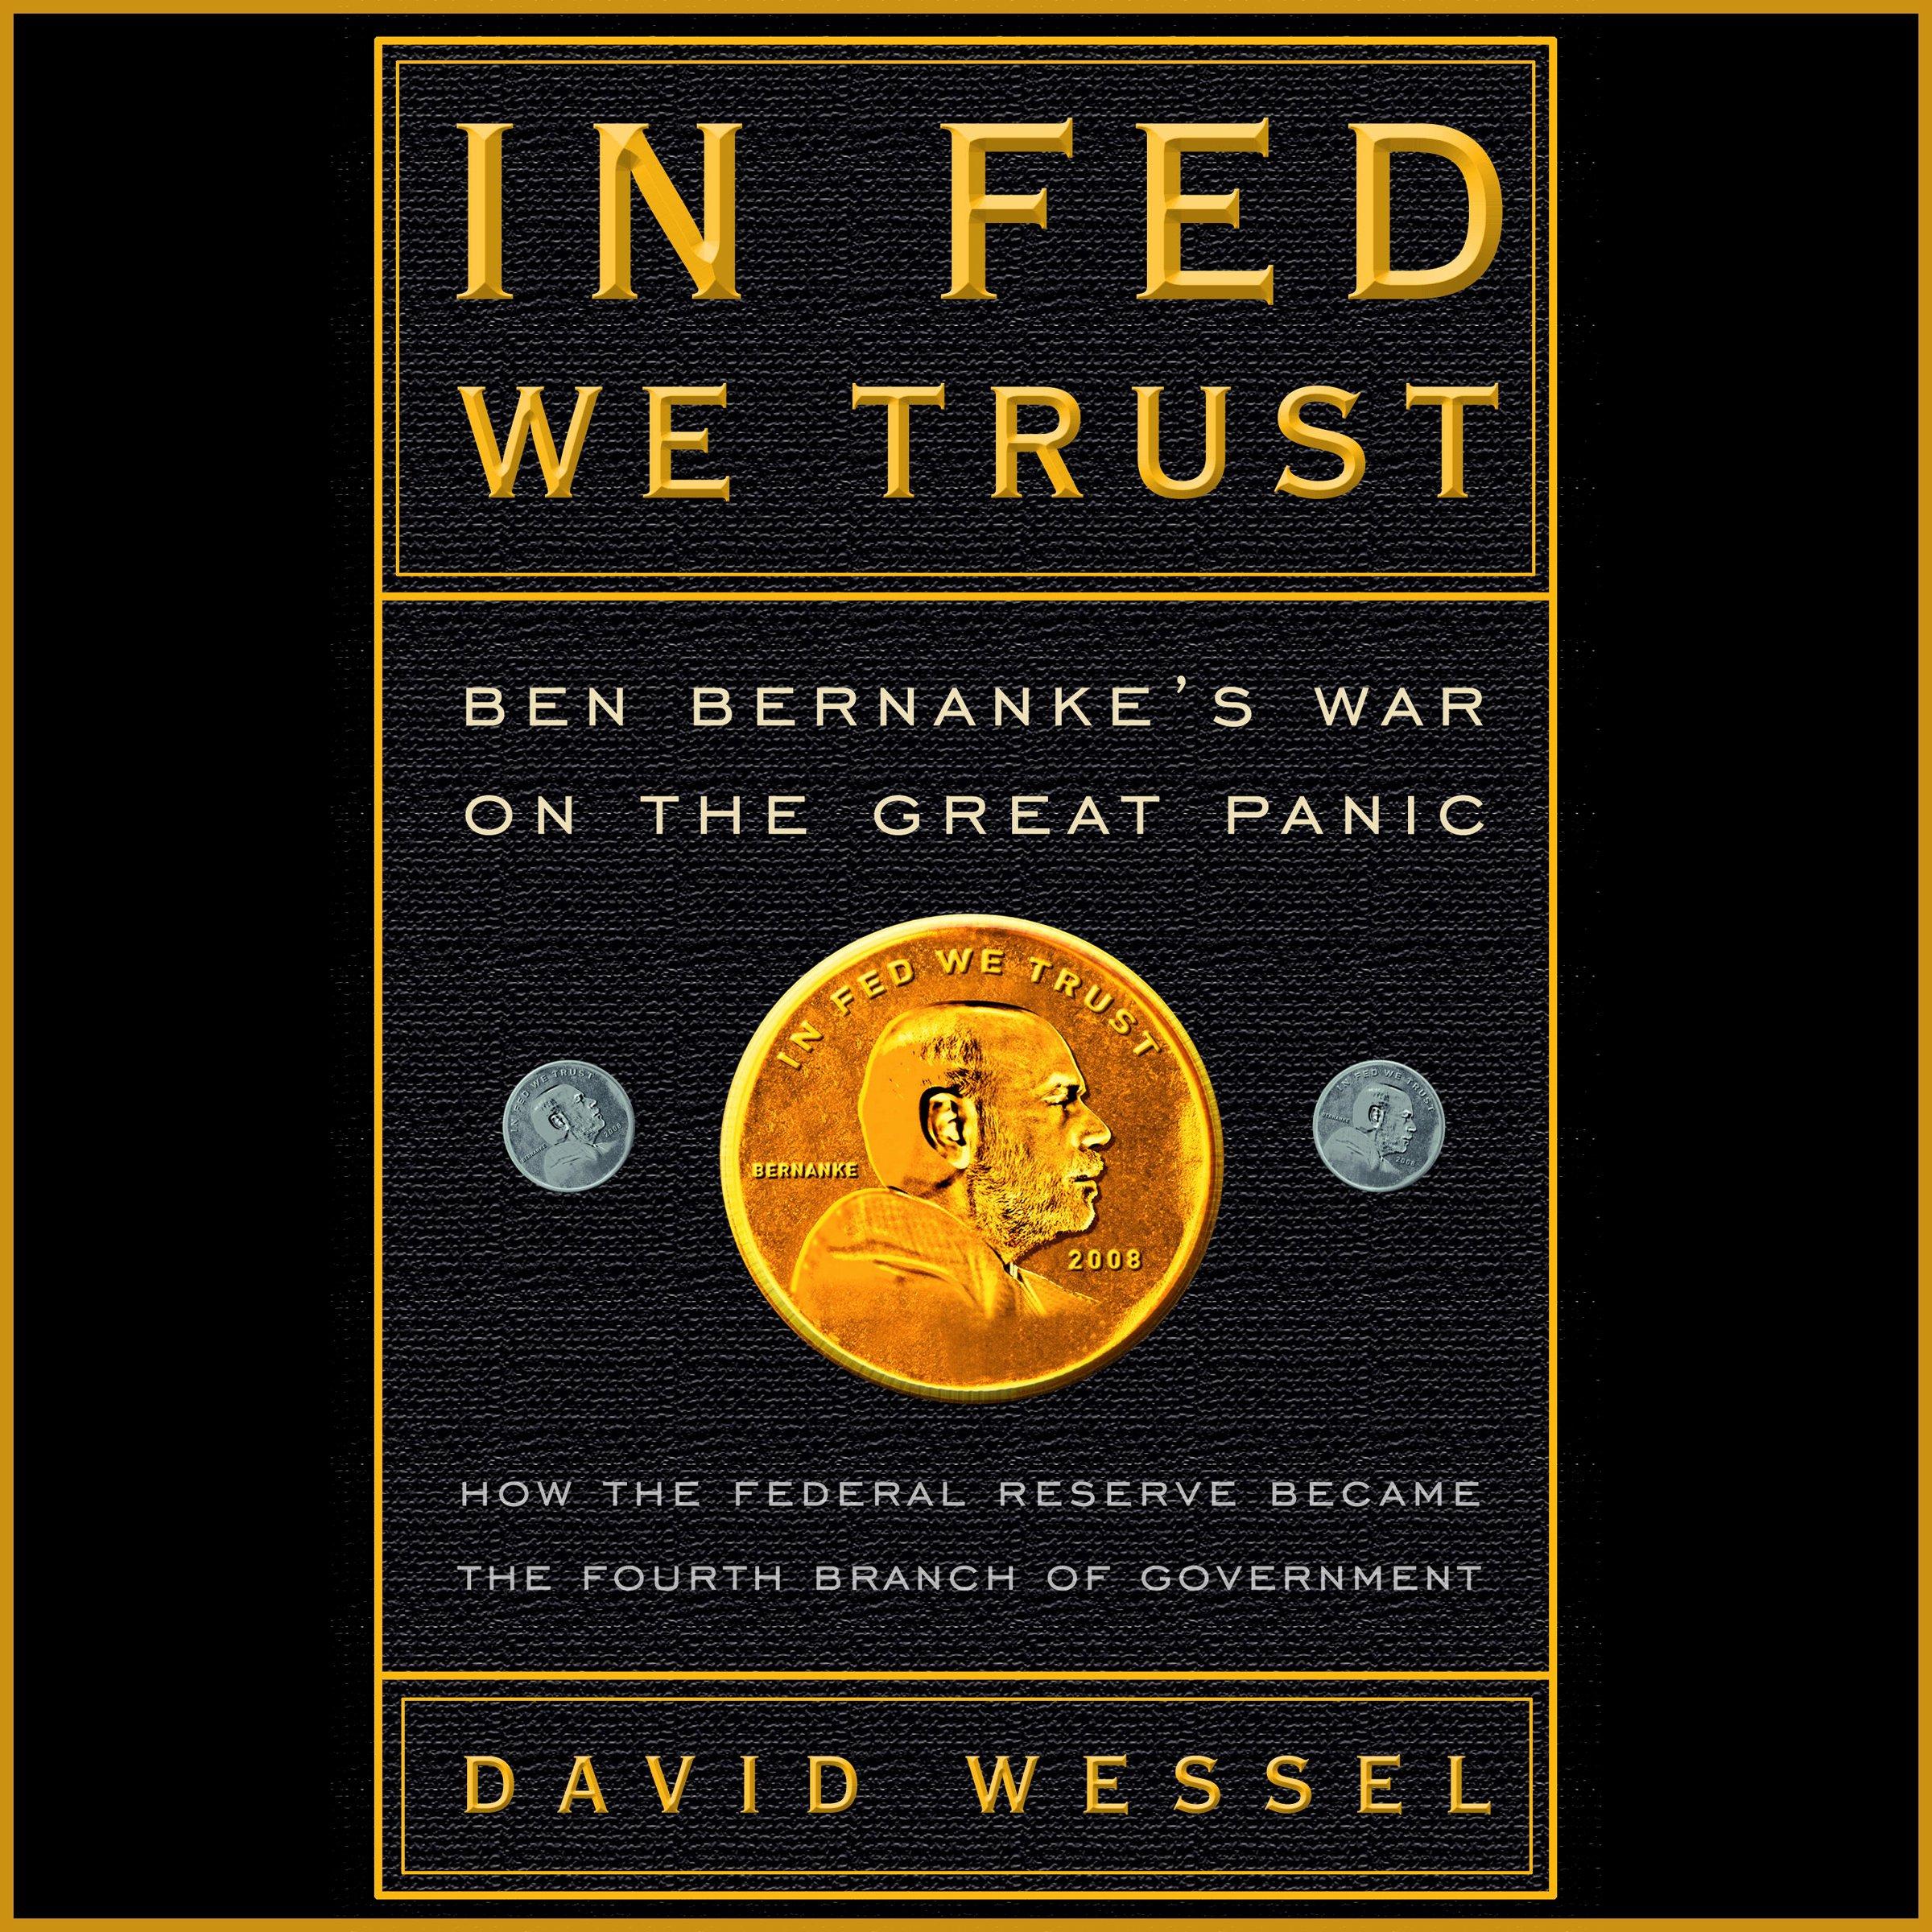 In Fed We Trust: Ben Bernanke's War on the Great Panic by Random House Audio (Image #1)